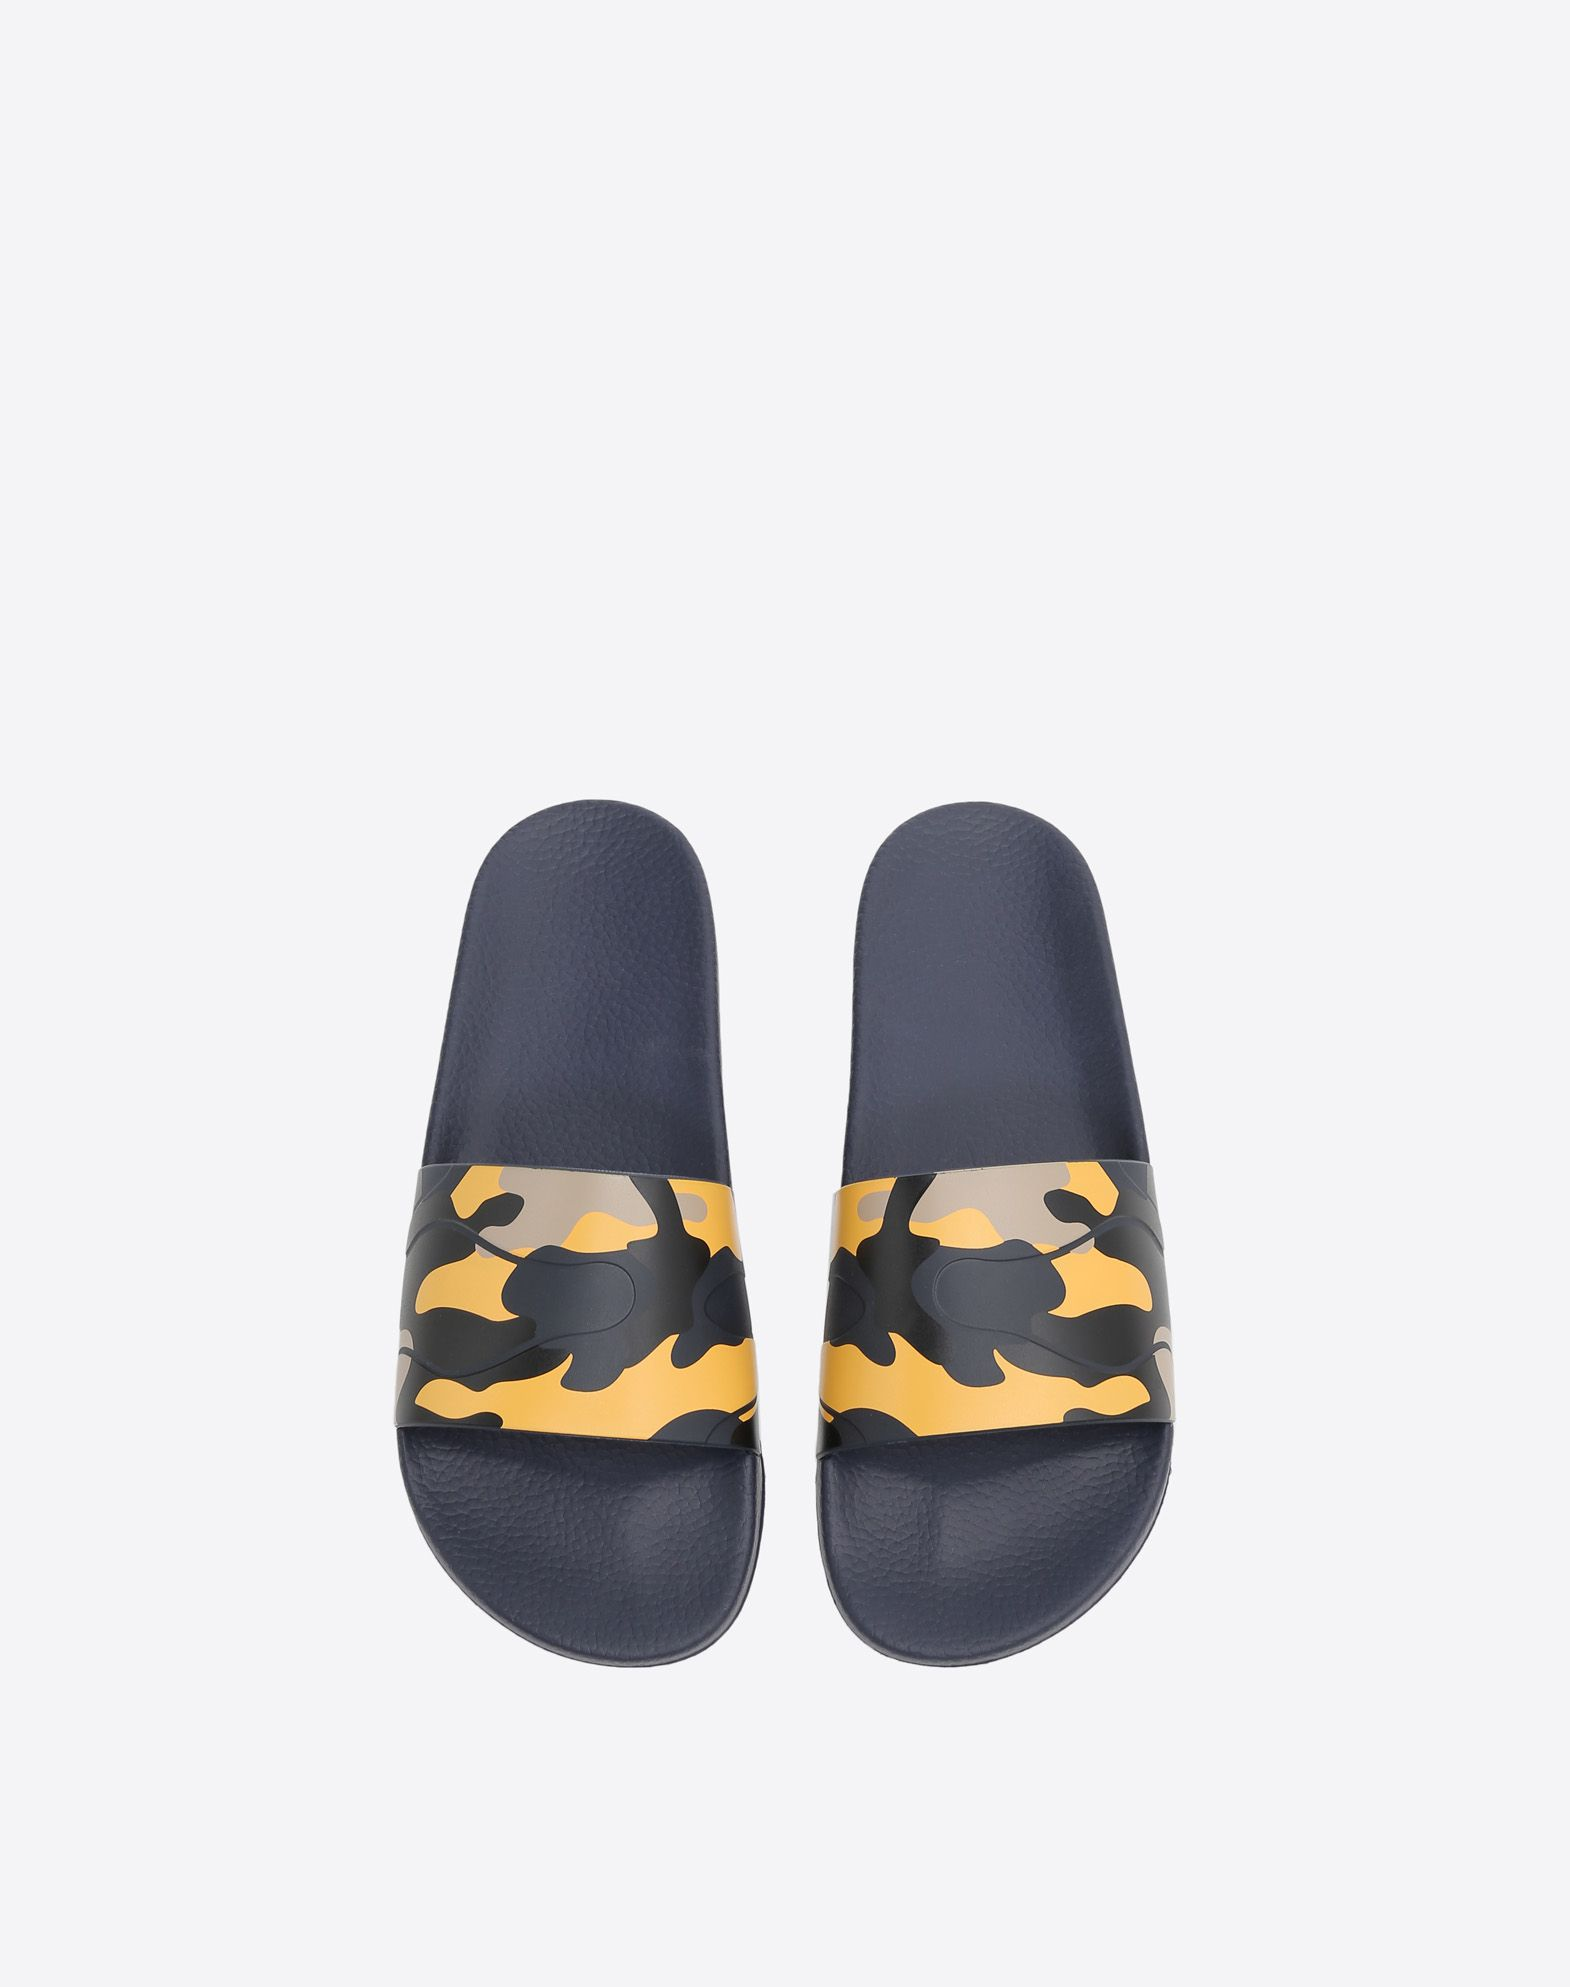 VALENTINO GARAVANI UOMO Camouflage 拖鞋式凉鞋 橡胶拖鞋式凉鞋 U e